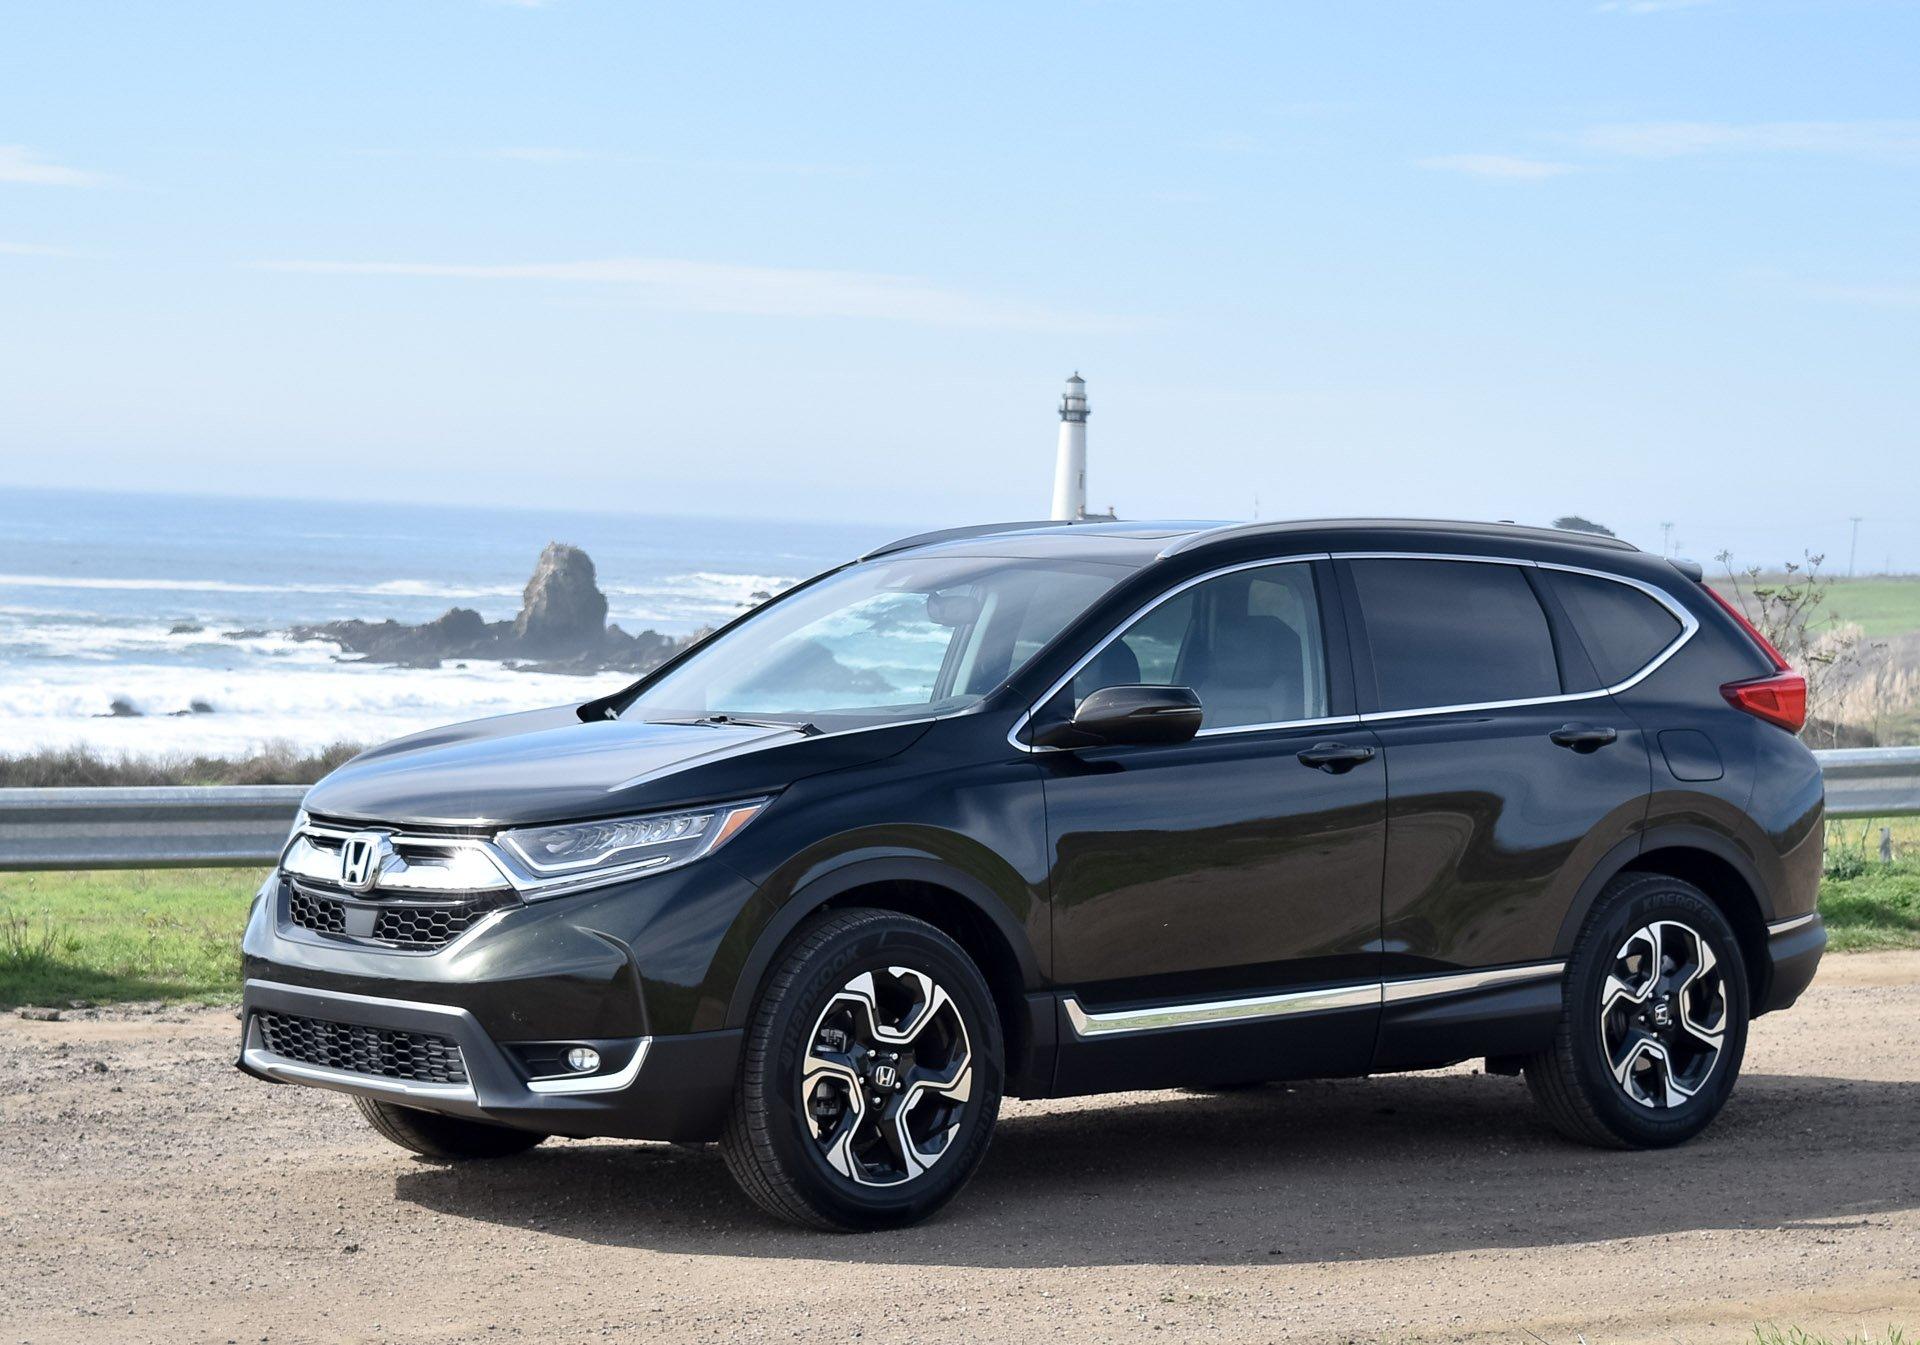 First Drive Review: 2017 Honda CR-V